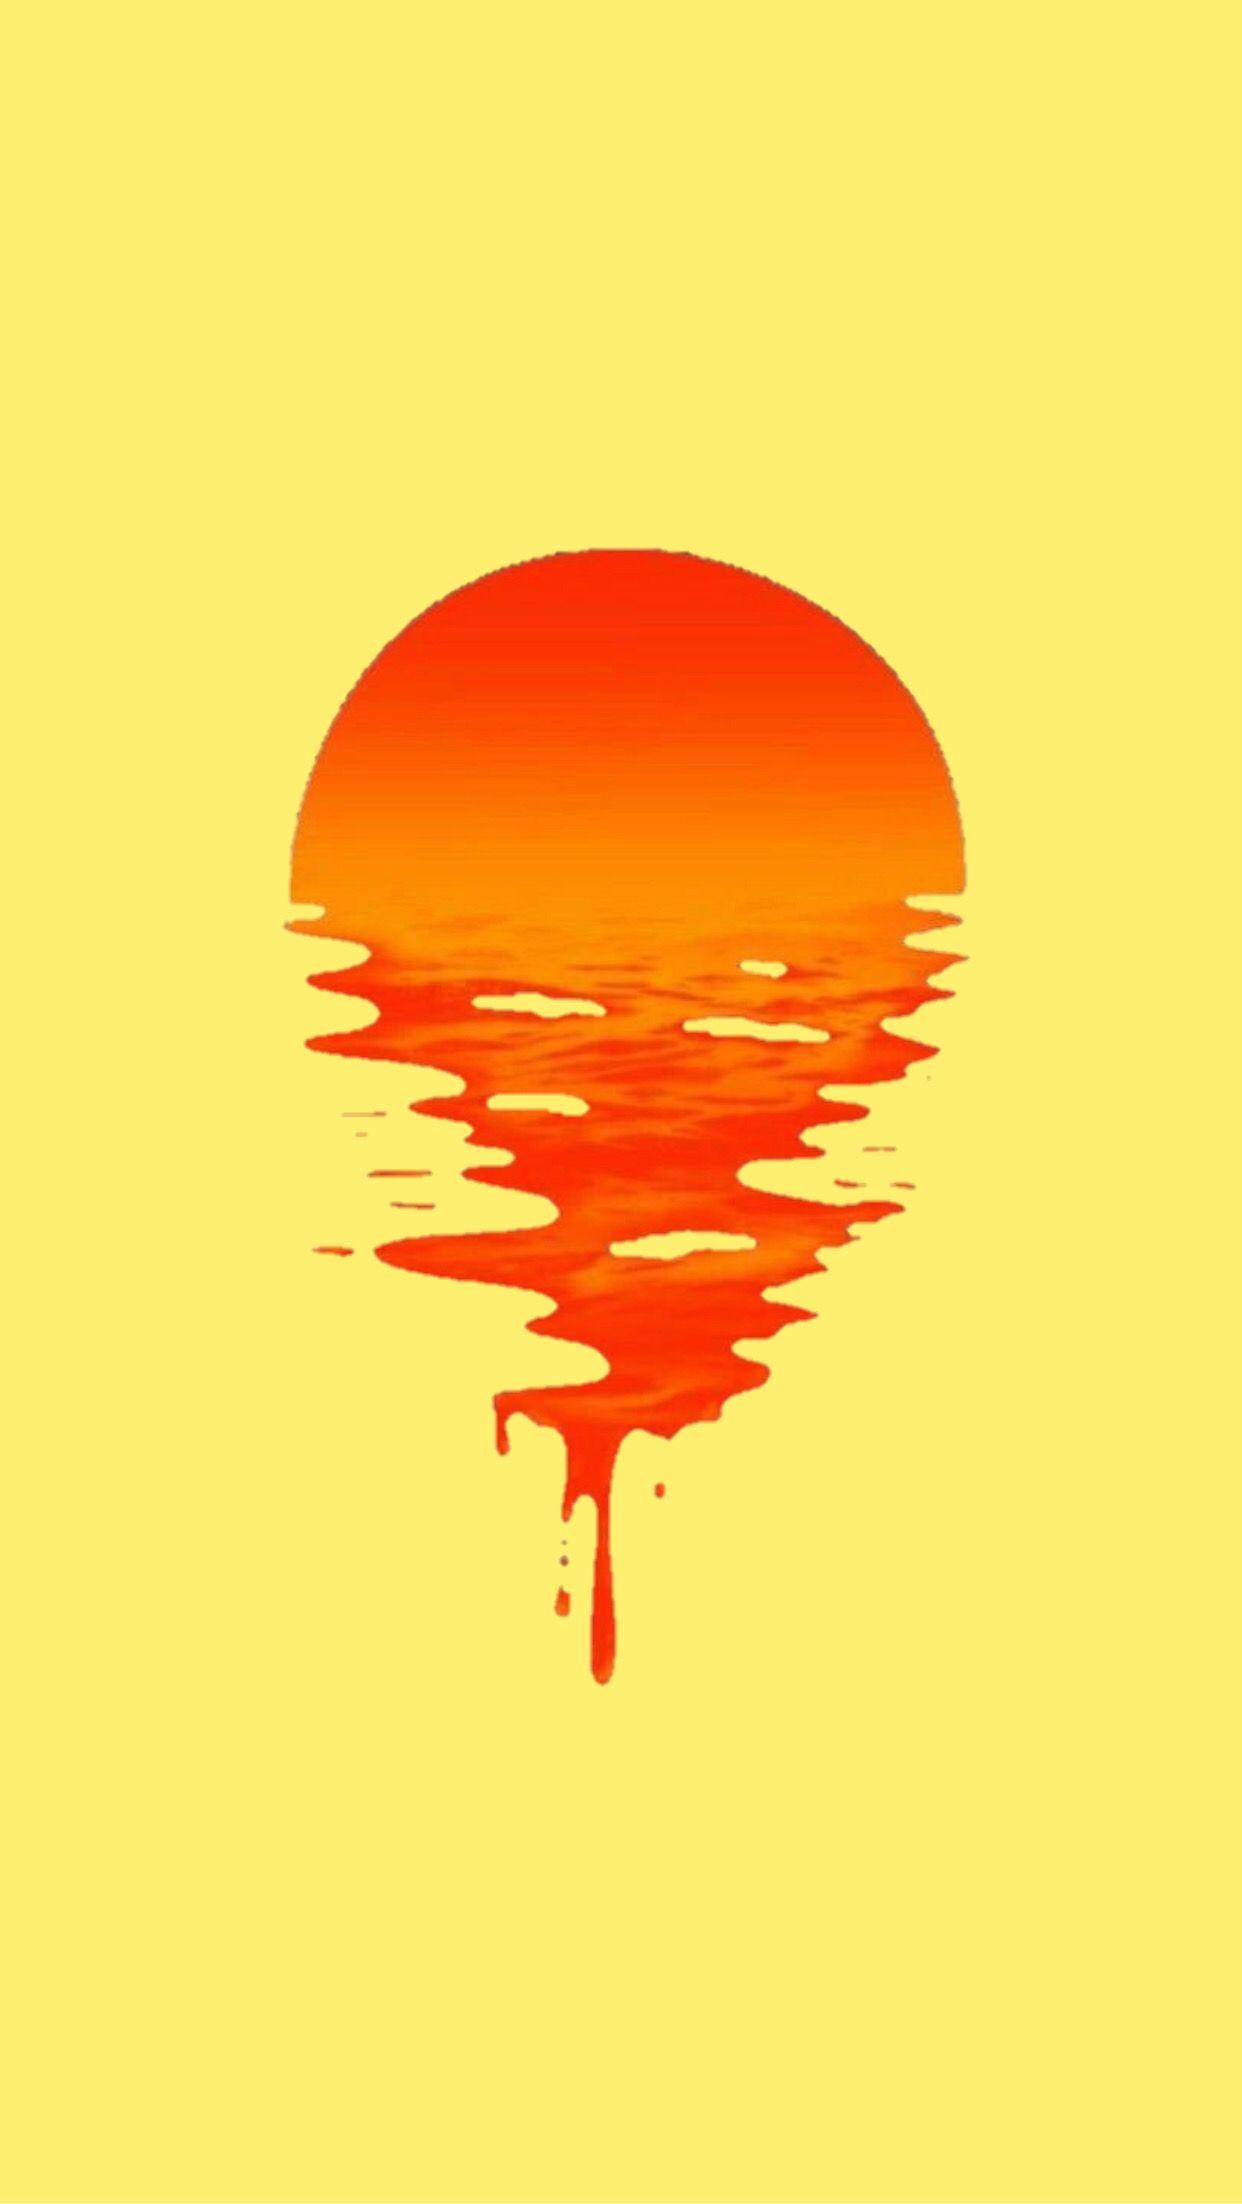 Yellow Red Orange Wallpaper Lockscreen Background Sunset